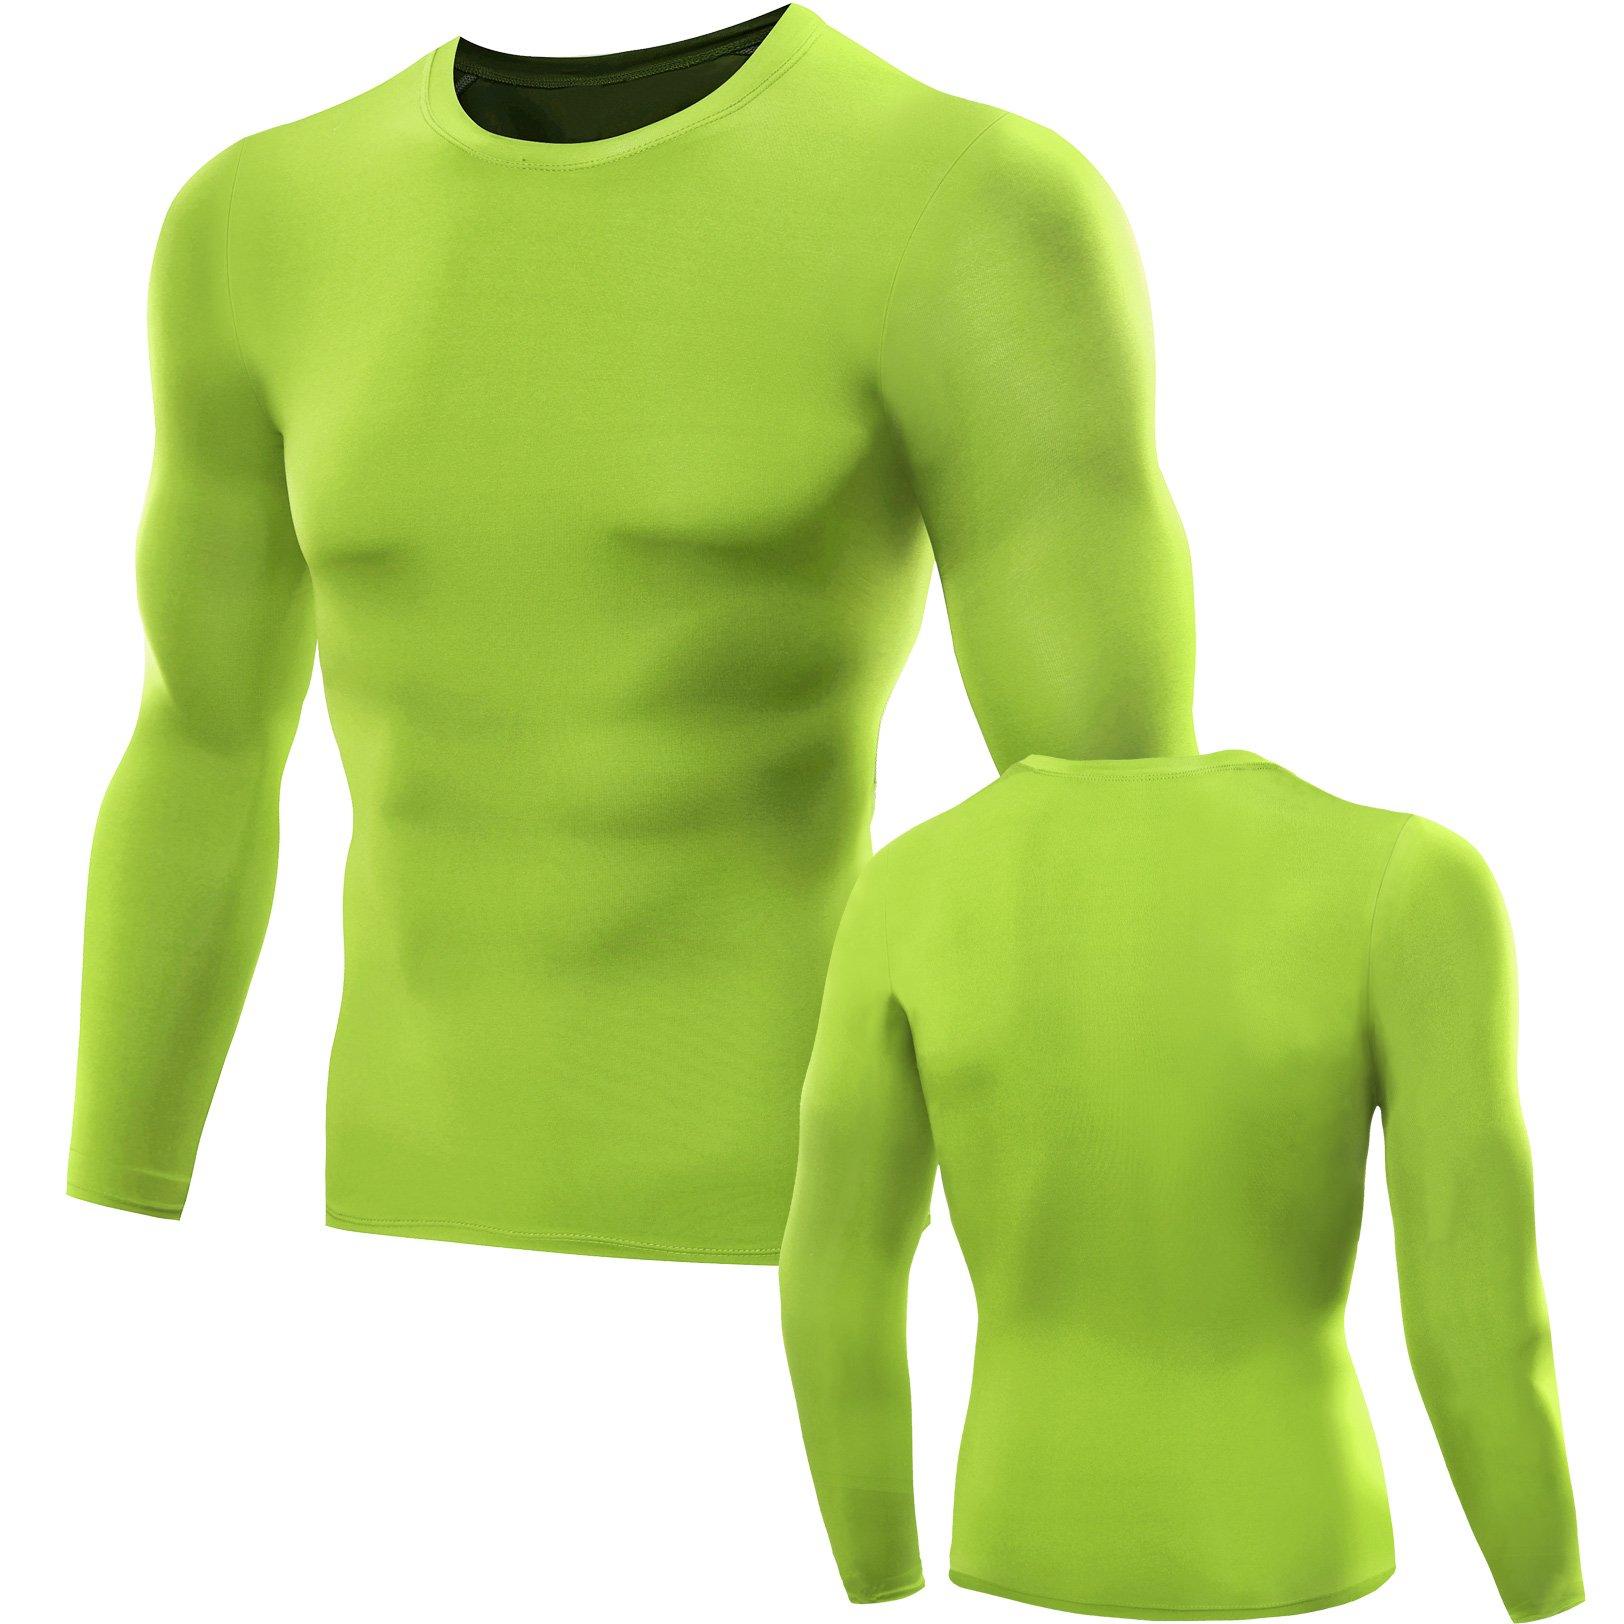 1dbd0df387bd Galleon - Neleus Men's 3 Pack Cool Dry Compression Baselayer Long Sleeve T  Shirts,5021,Green,L